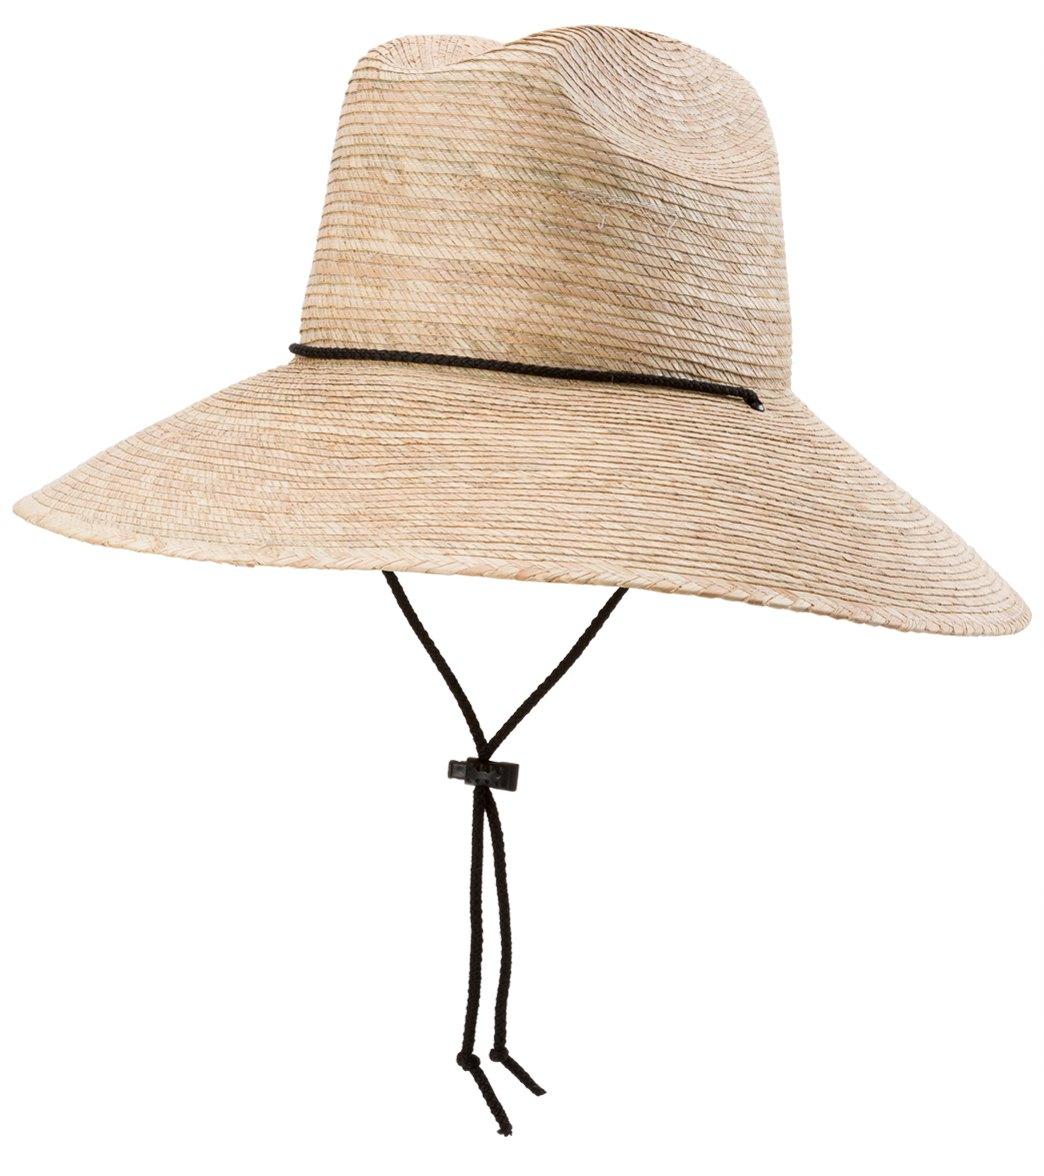 ea2a3e72132 Wet Products Ultra Premium Flexfit Lifeguard Hat